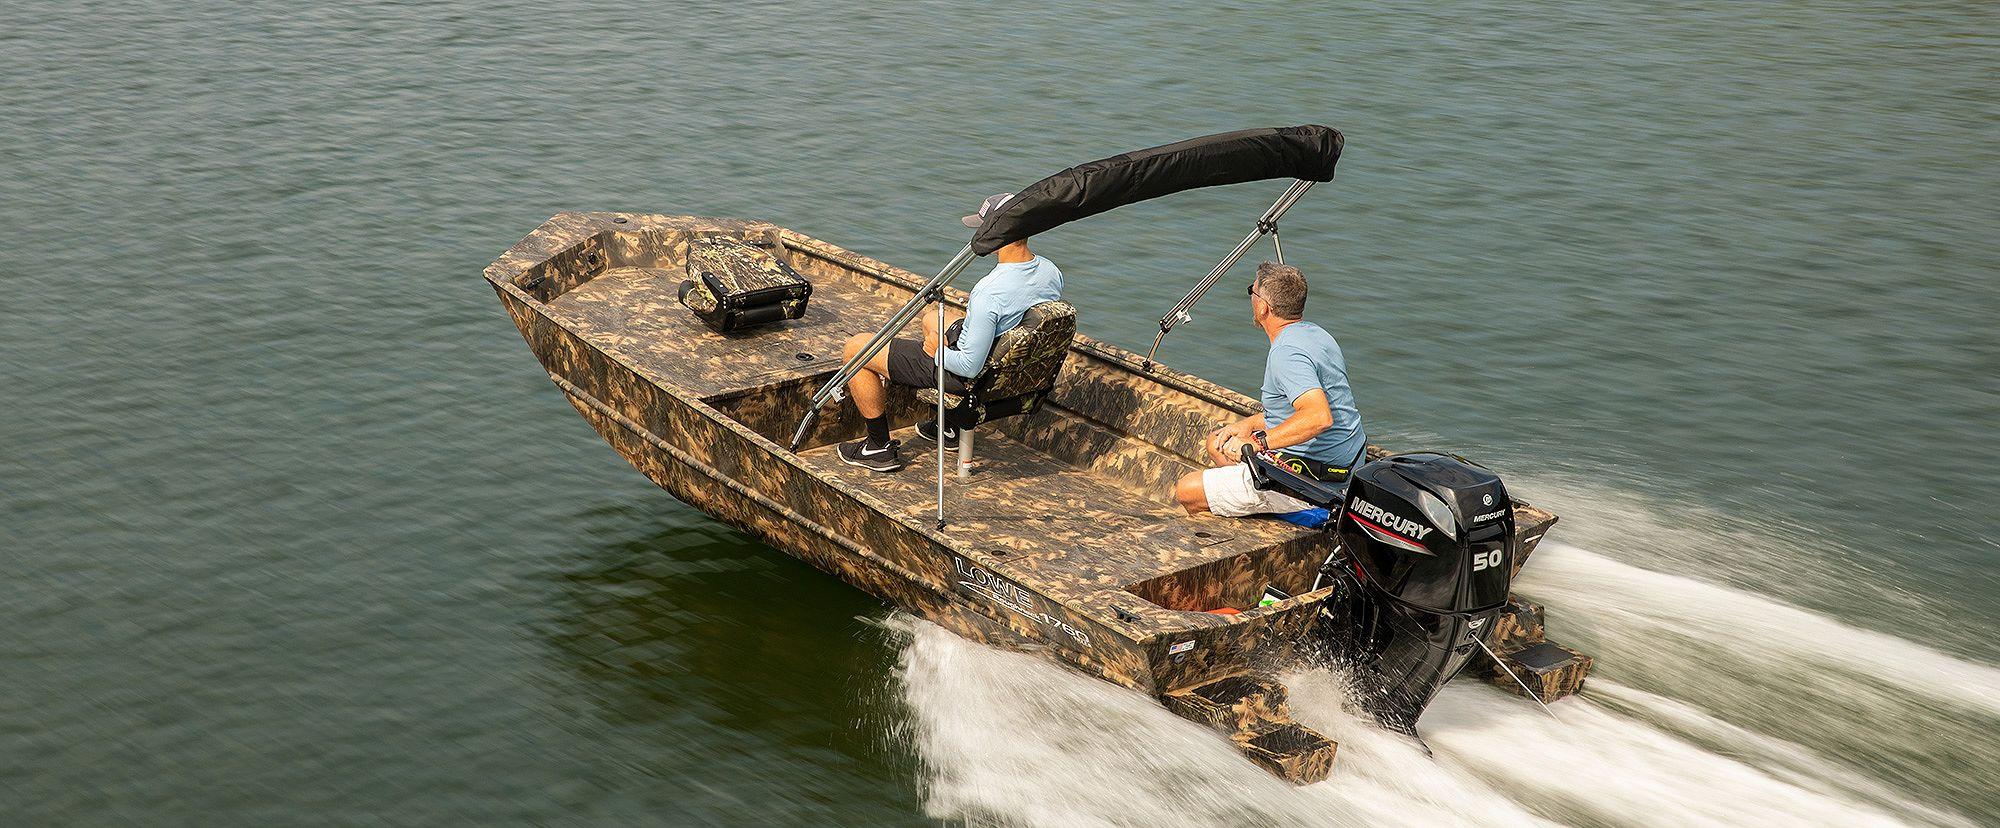 Lowe Boats RX1760 Hero Image